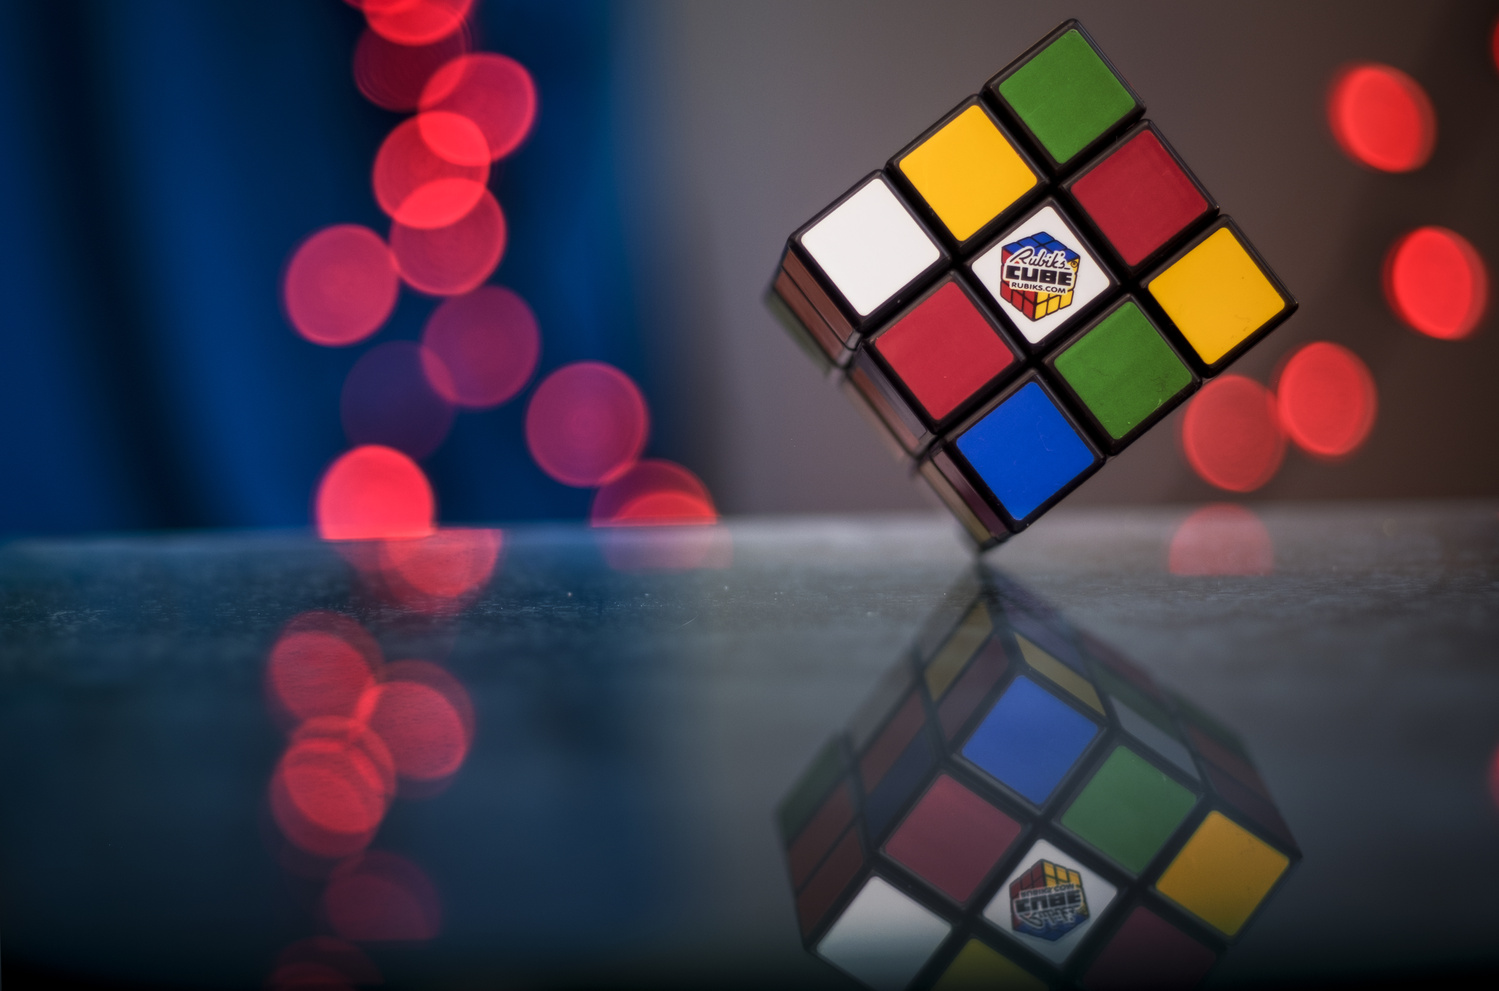 Rubik's Dream by Spencer Douglas